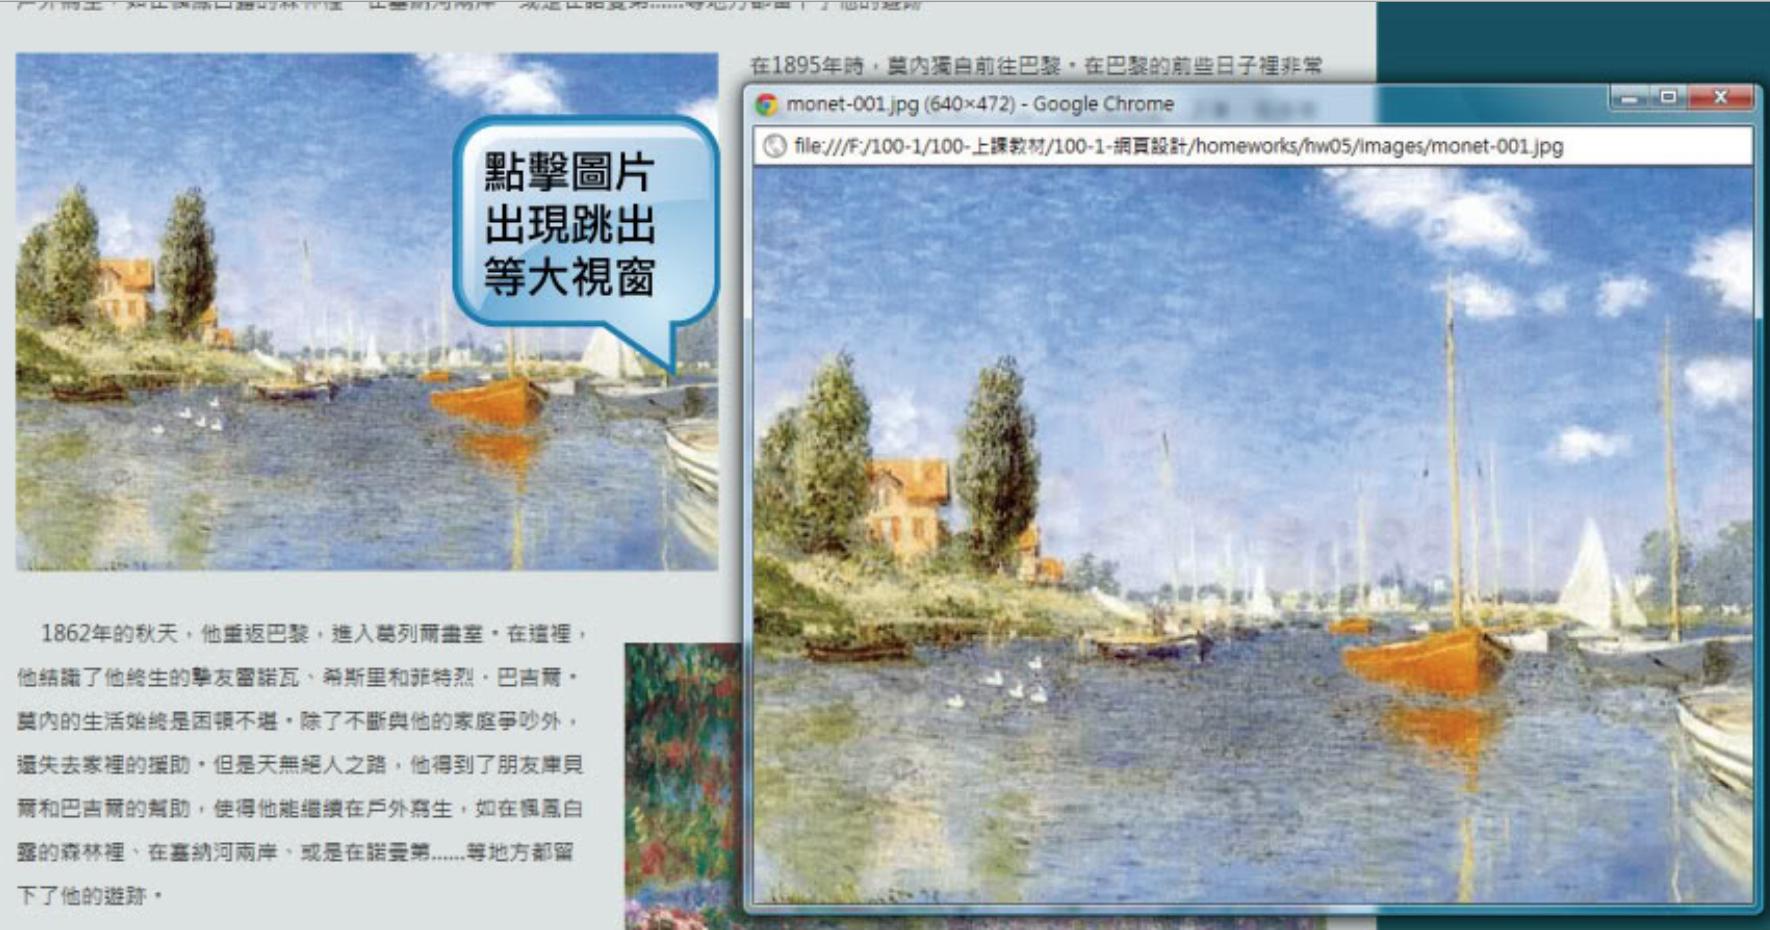 http://mepopedia.com/~jinjin/web/img/518.png